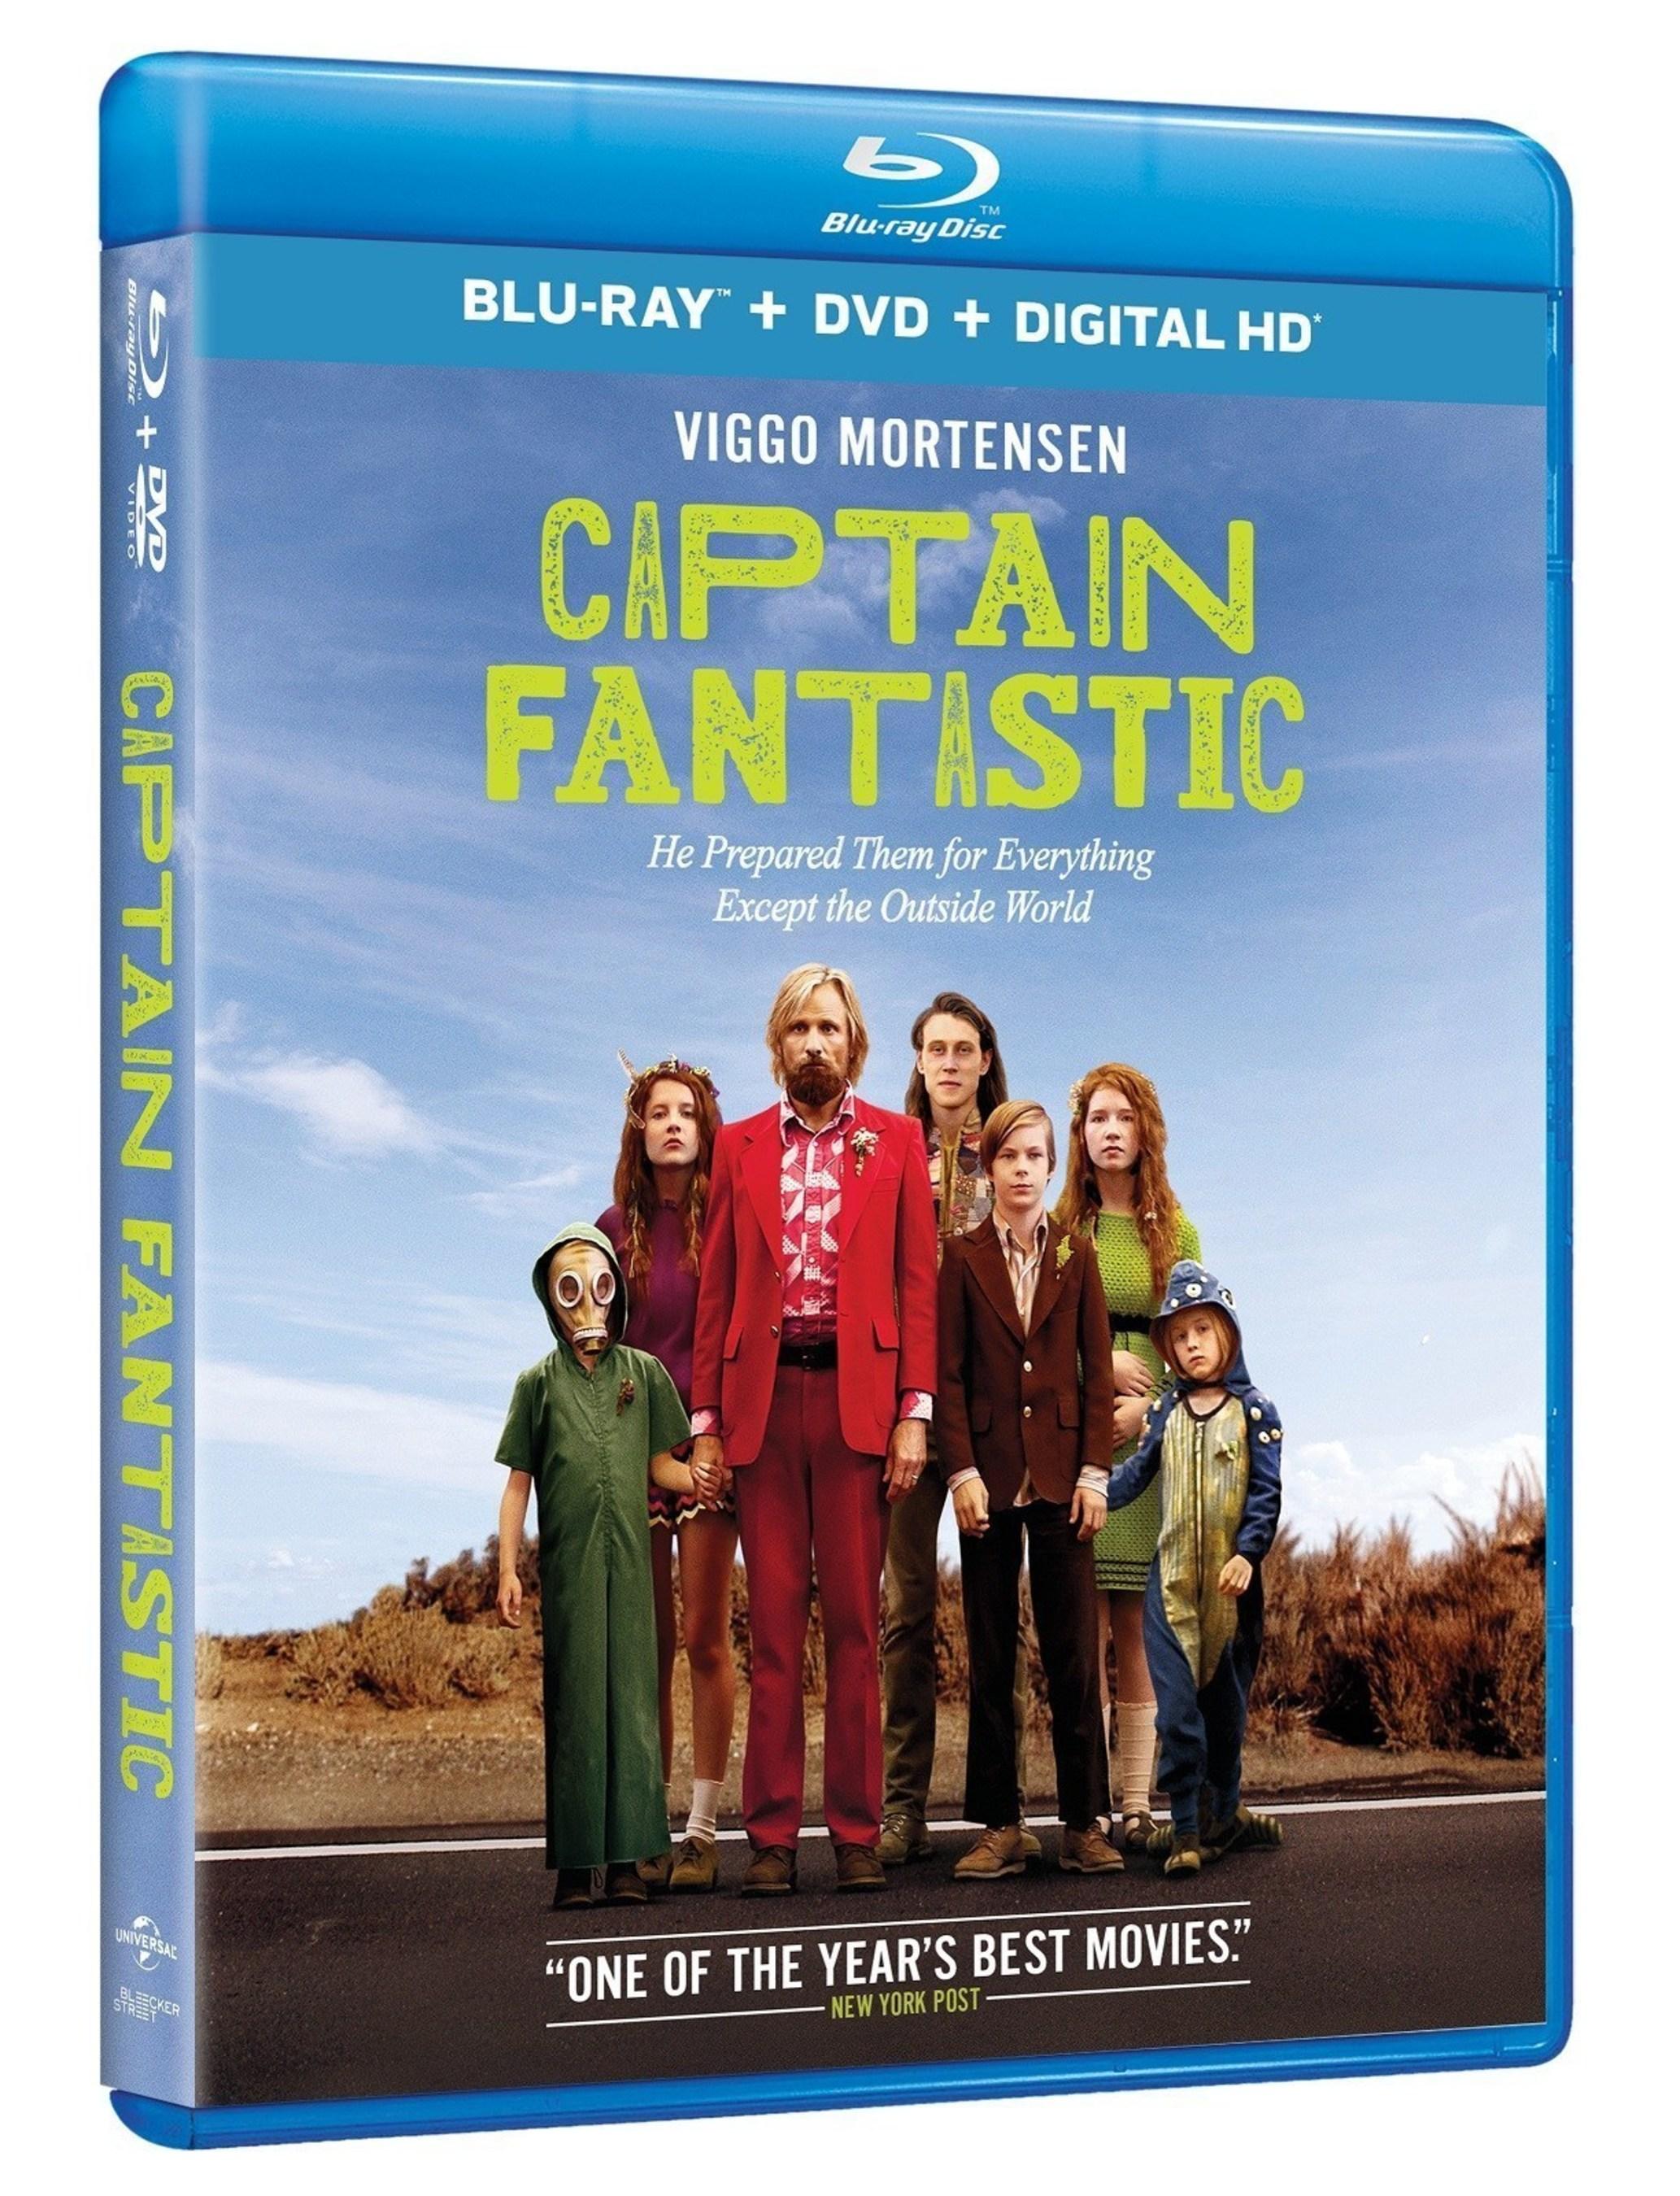 Viggo Mortensen Stars In The Heartwarming Family Drama: Captain Fantastic